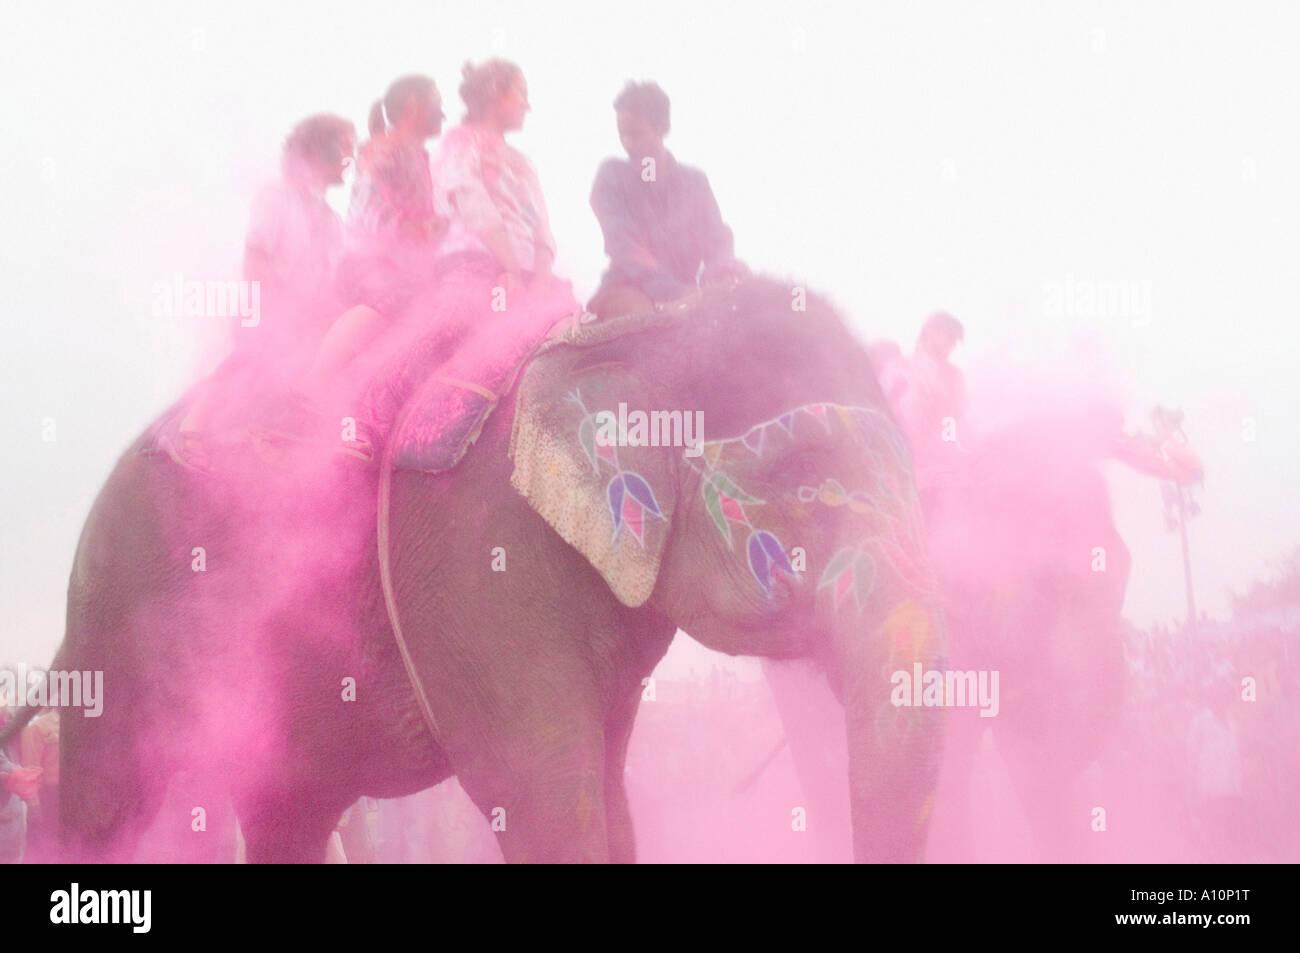 Gruppo di persone a cavallo di Elefanti Elefante, Festival, Jaipur, Rajasthan, India Foto Stock